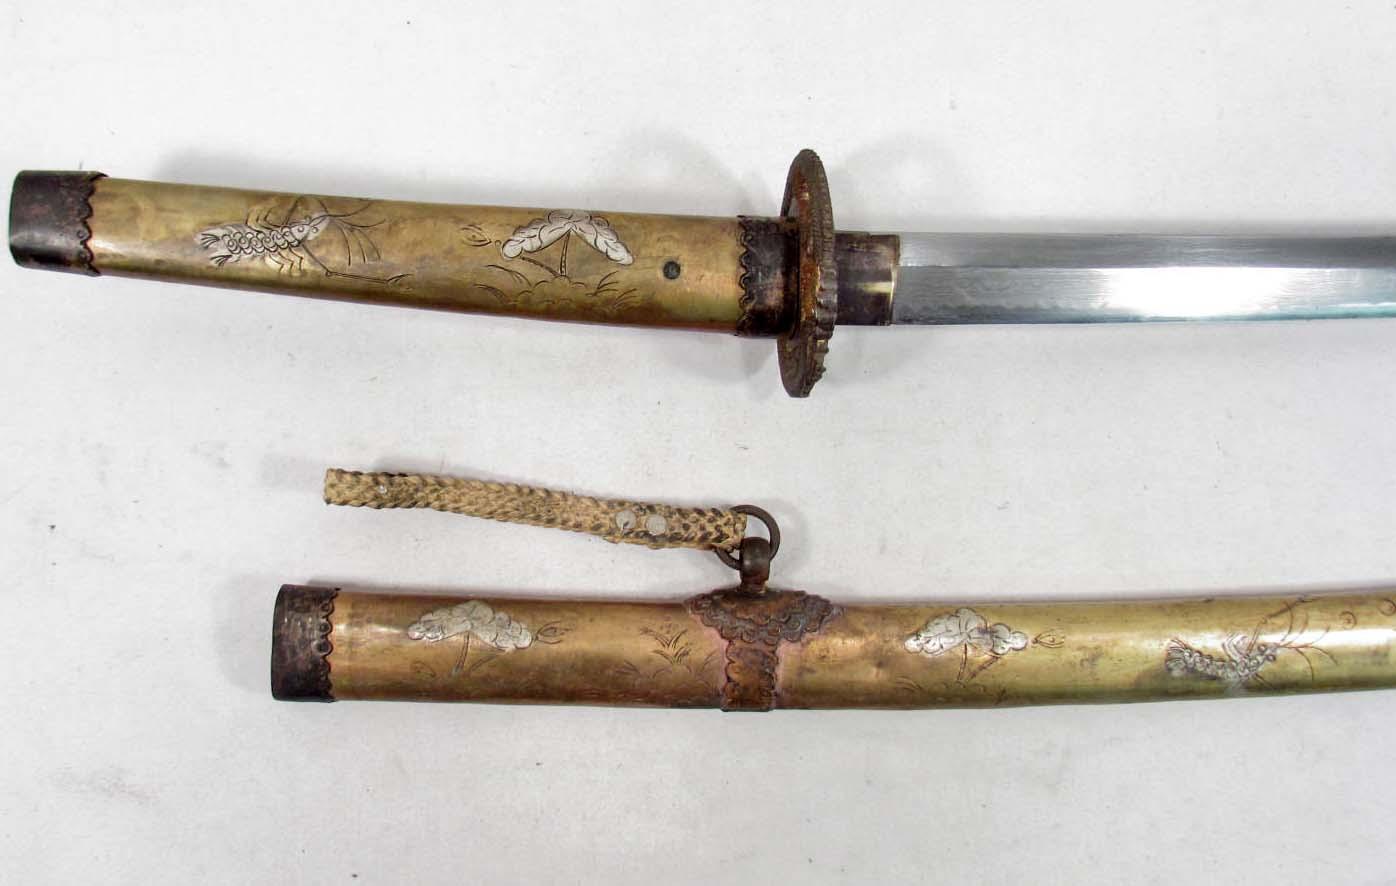 RARE JAPANESE SAMURAI / KATANA SWORD W/ DETAILED SAYA / SCABBARD - SIGNED  BLADE